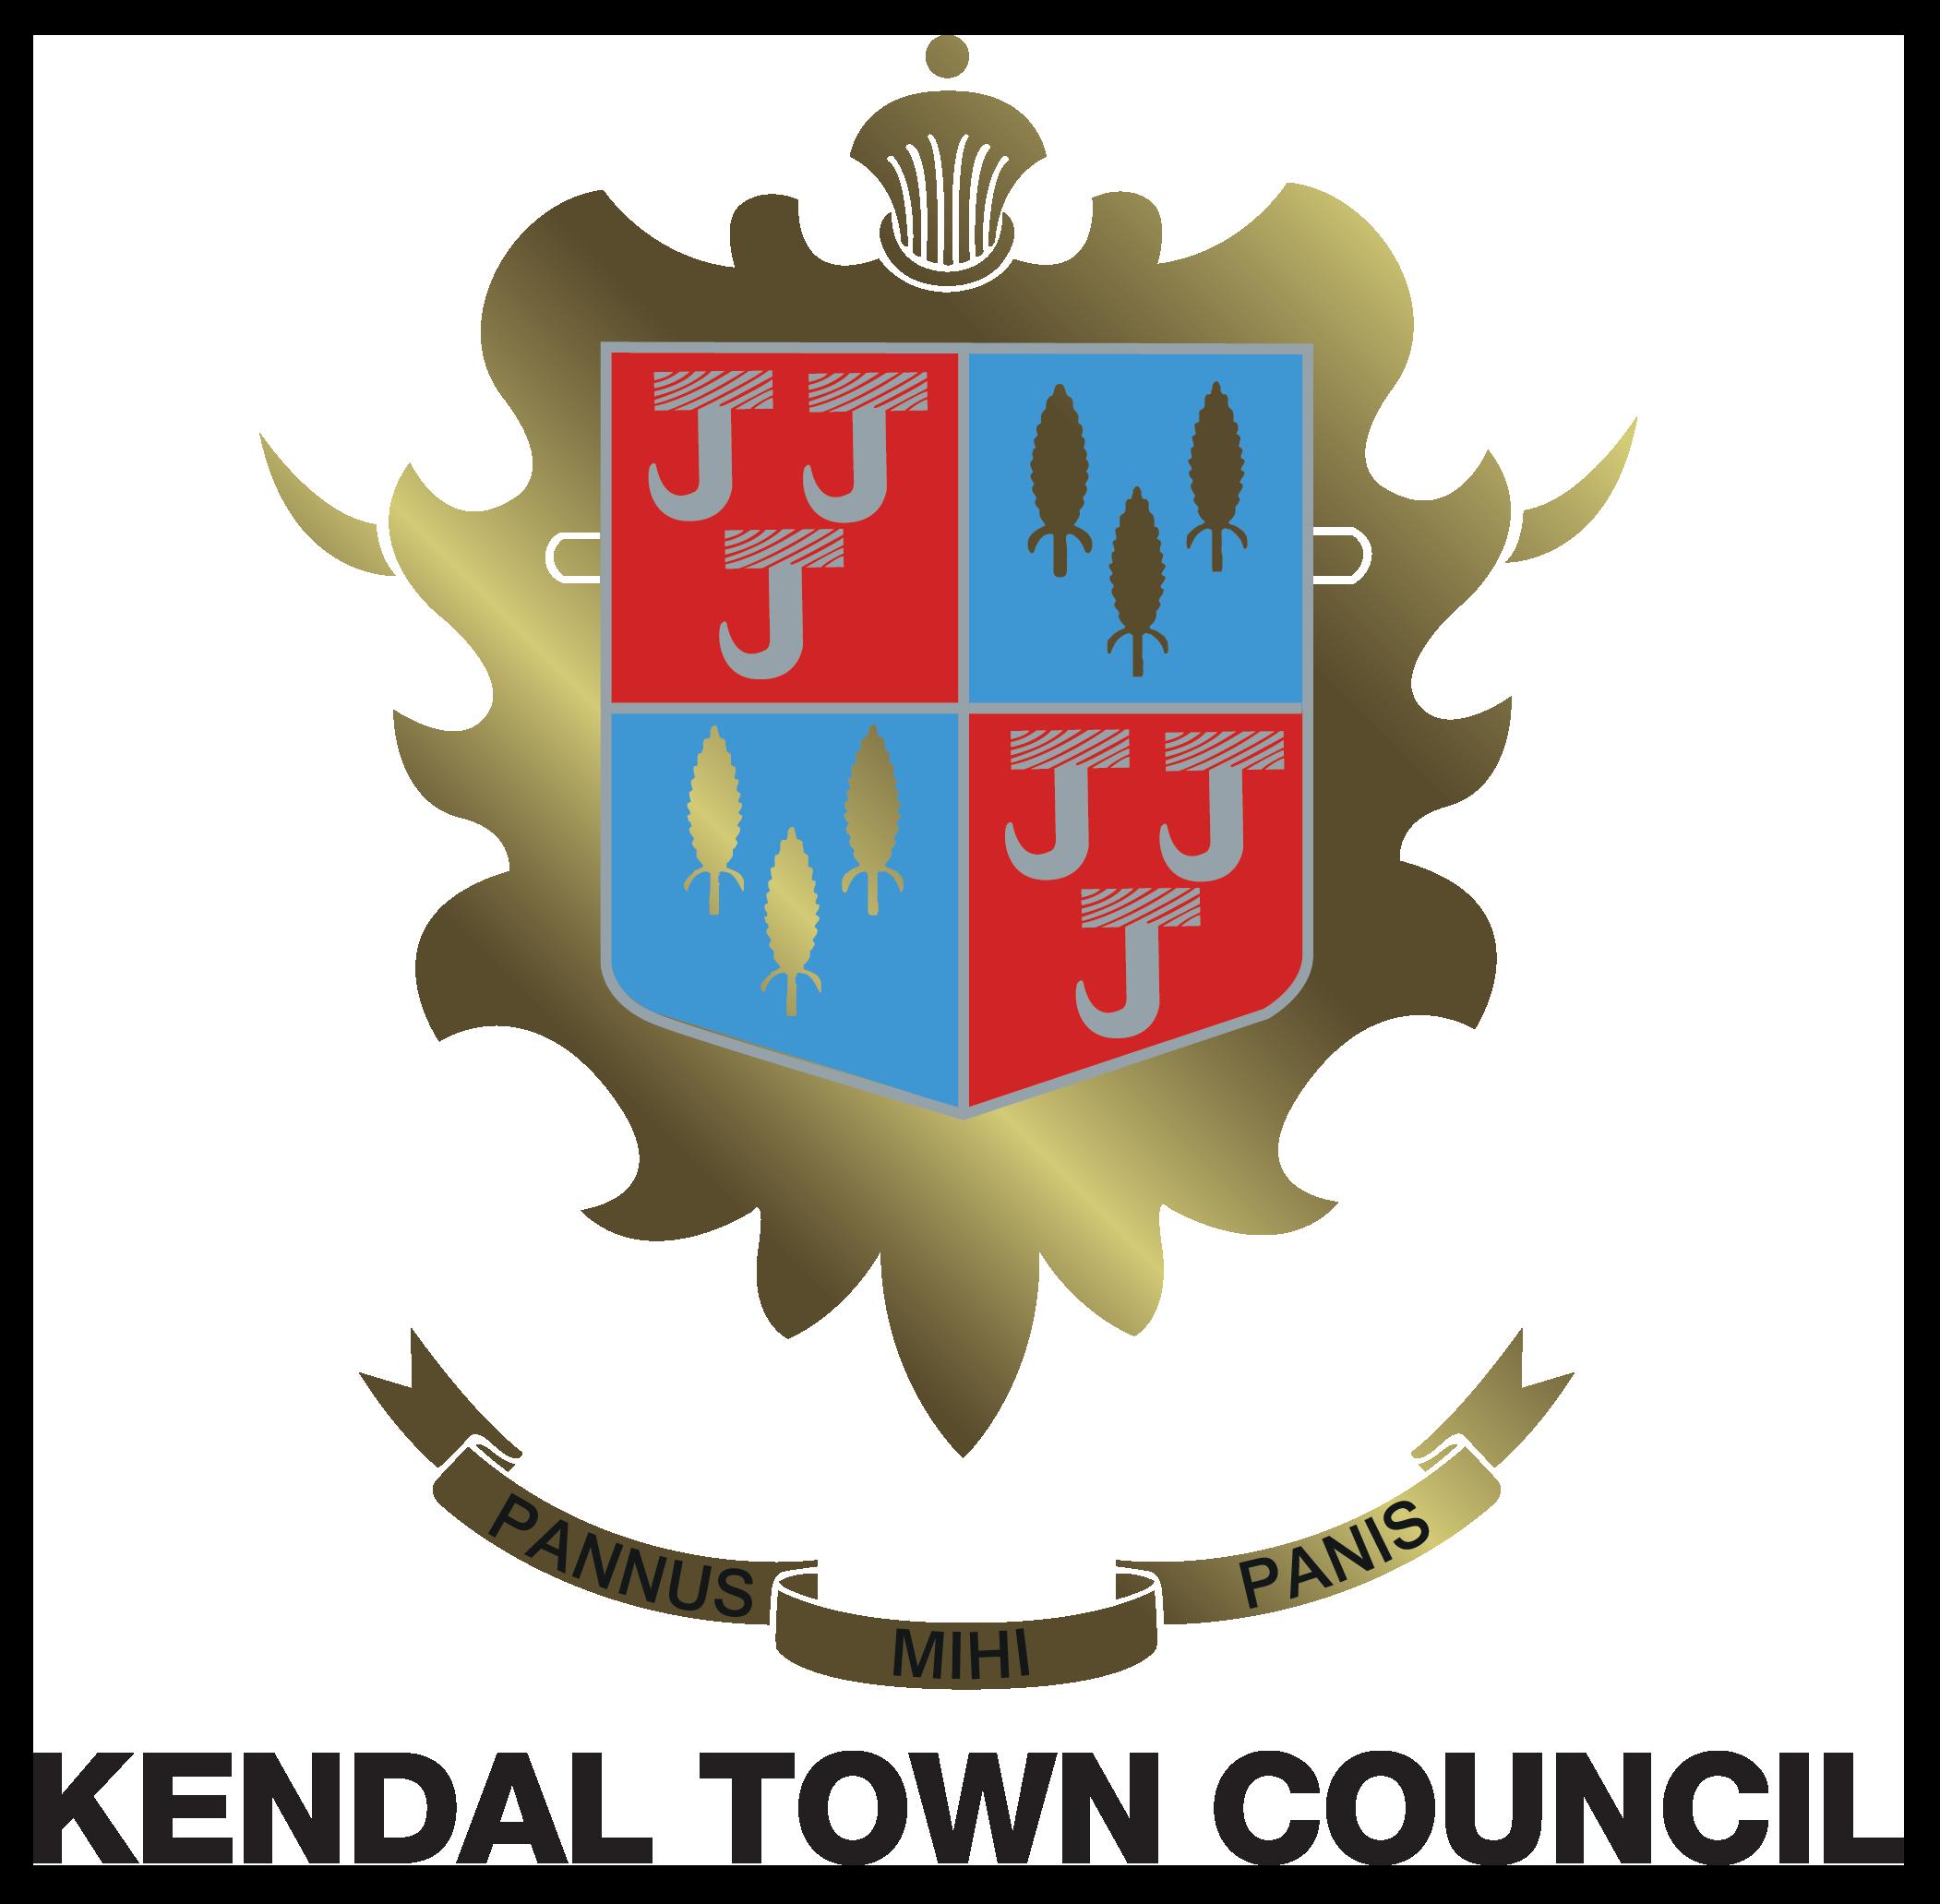 KendalTownCouncil_blend_Helvetica.png